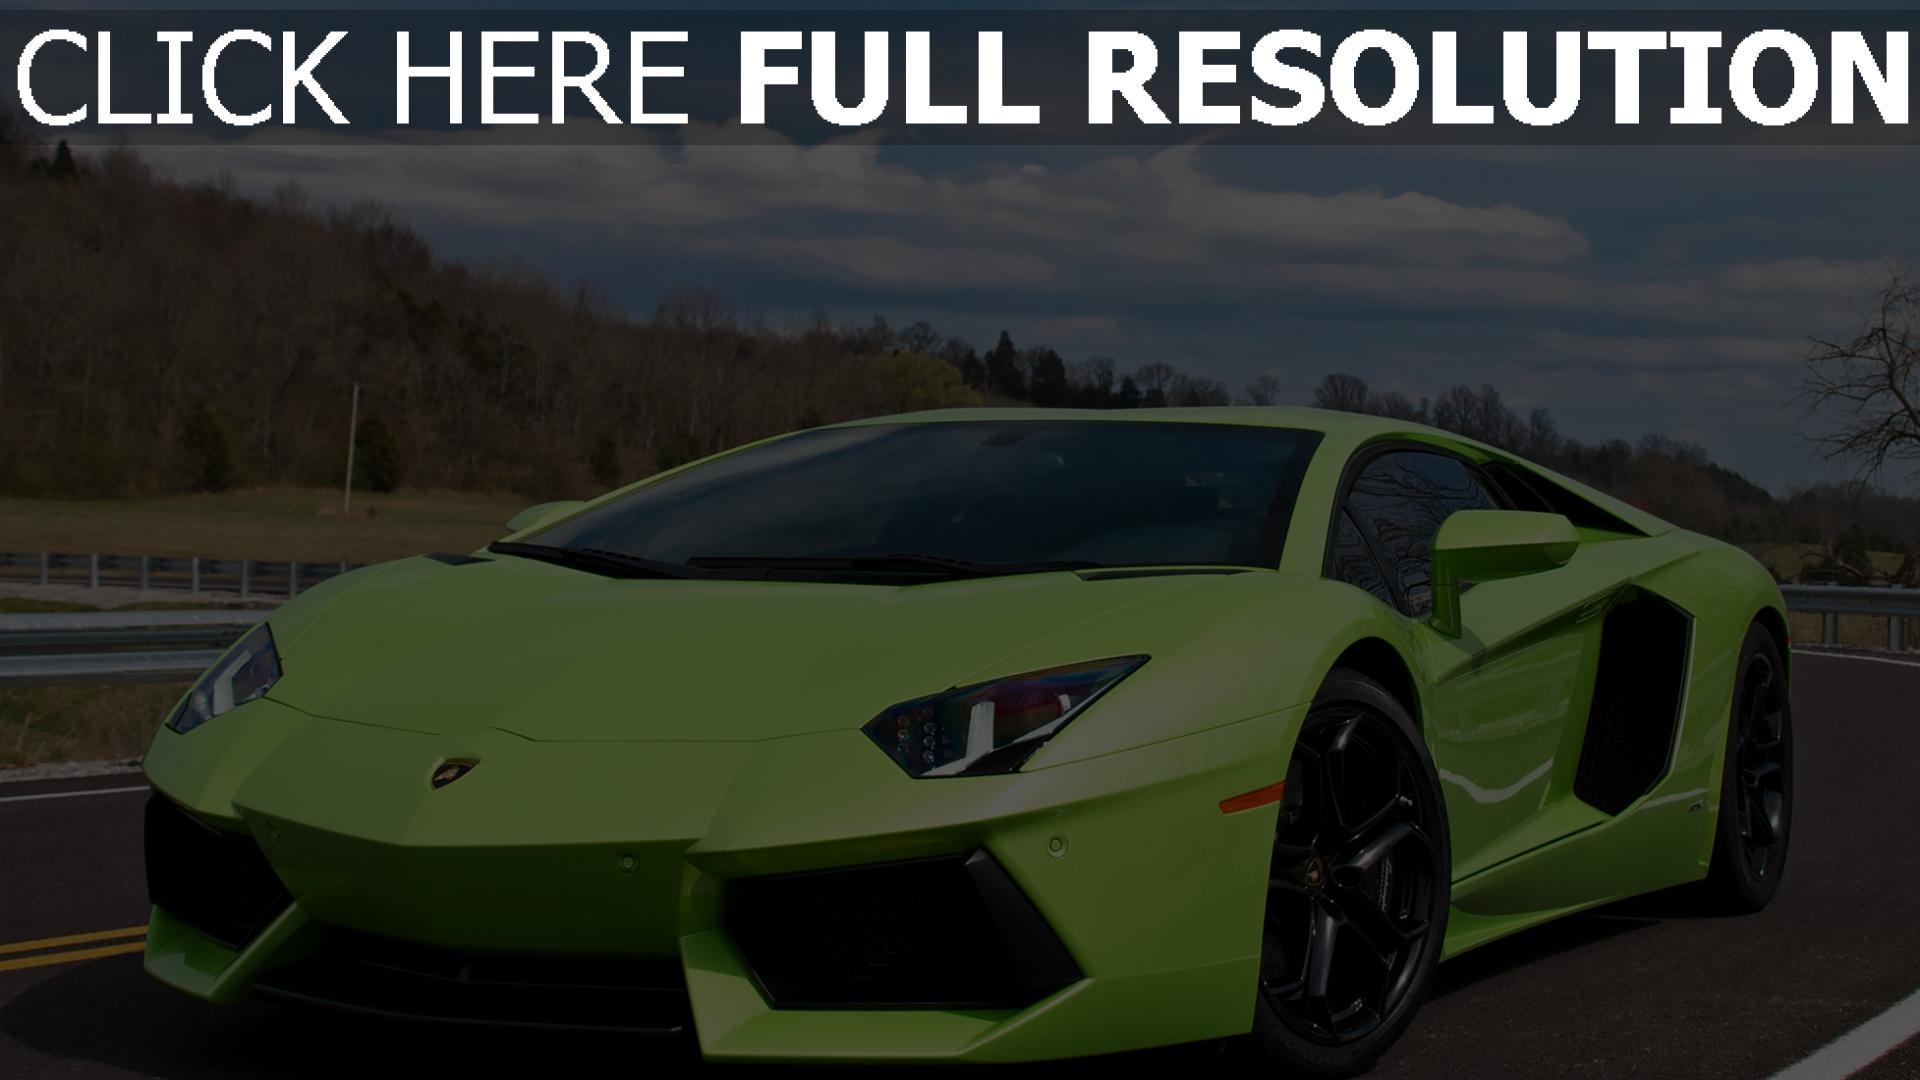 Hd Hintergrundbilder Aventador Lamborghini Lp700 4 Gr 252 N